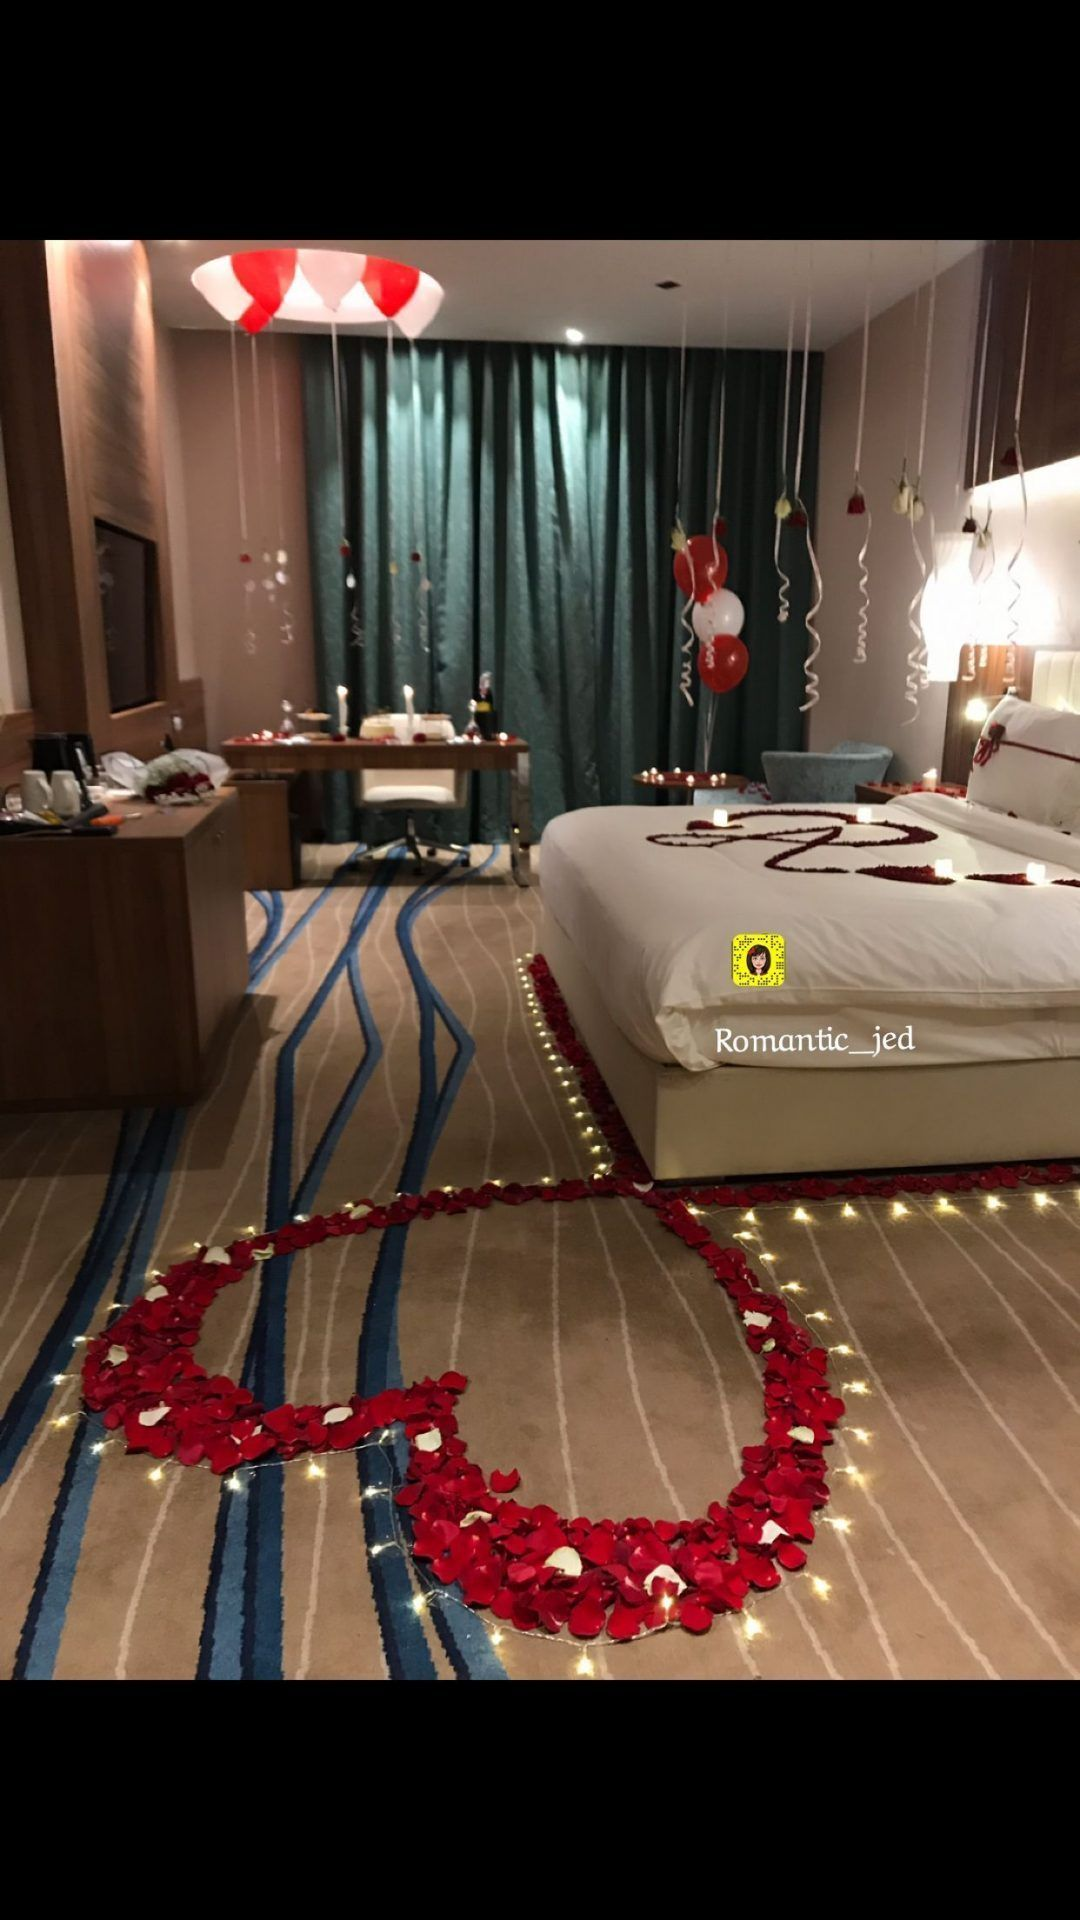 Romantic Bedroom Ideas For Wonderful Valentine Moments In 2020 Romantic Room Decoration Romantic Room Surprise Romantic Room